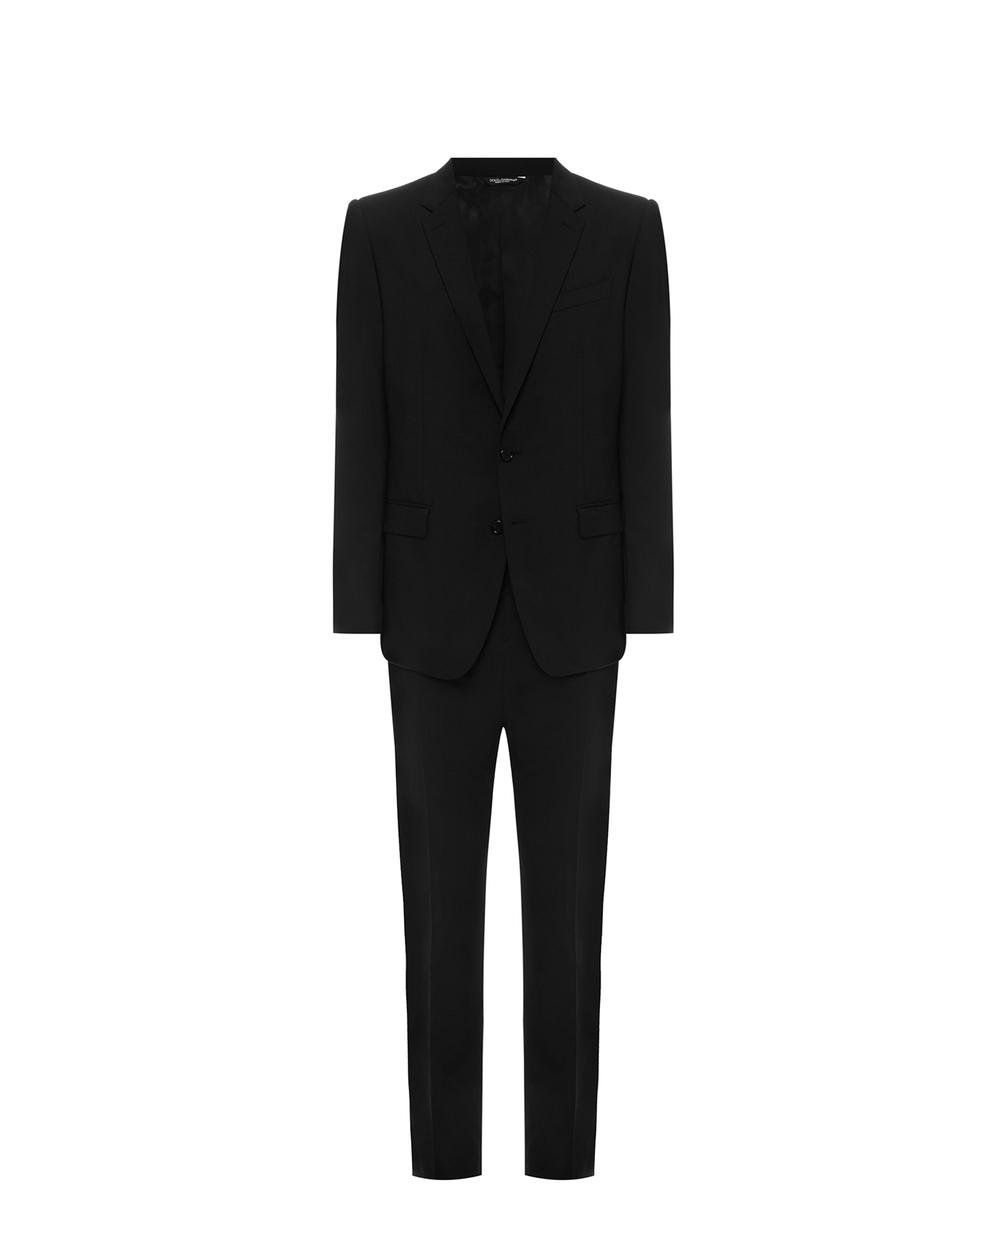 Шерстяной костюм Dolce&Gabbana GK0EMT-GEN97 — Kameron